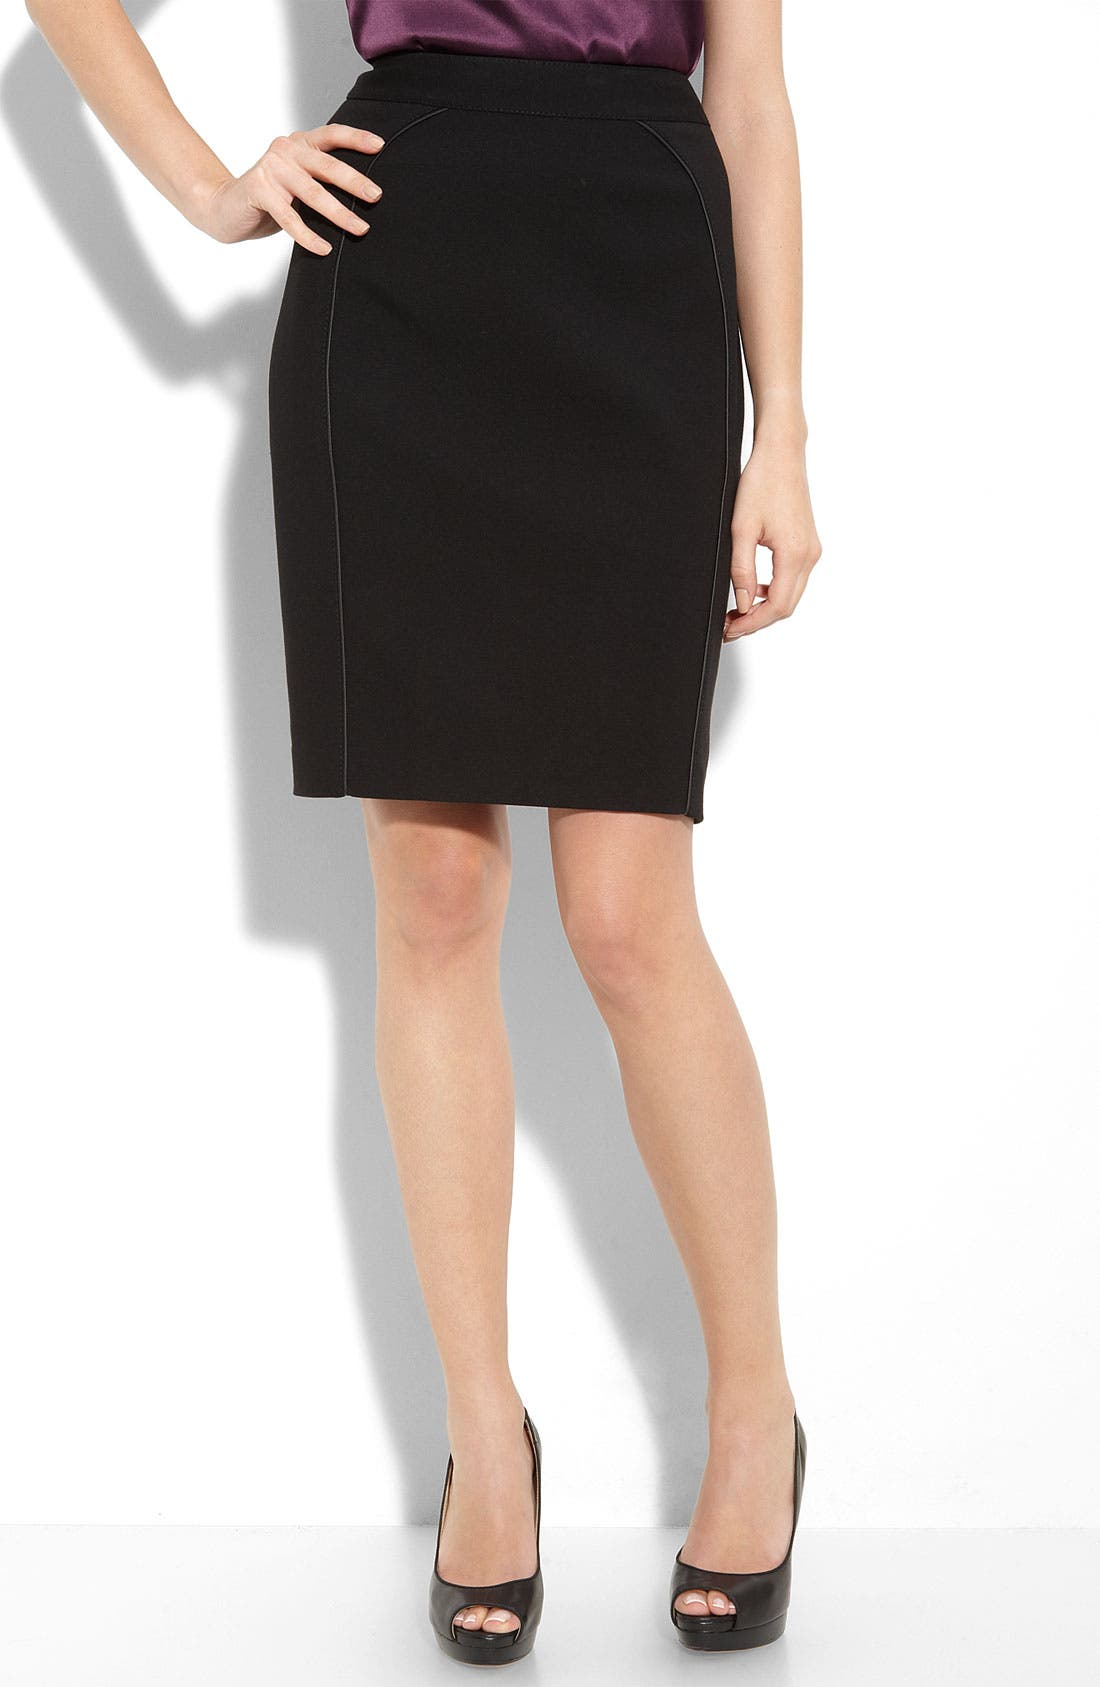 Alternate Image 1 Selected - Elie Tahari Exclusive for Nordstrom 'Ora' Skirt